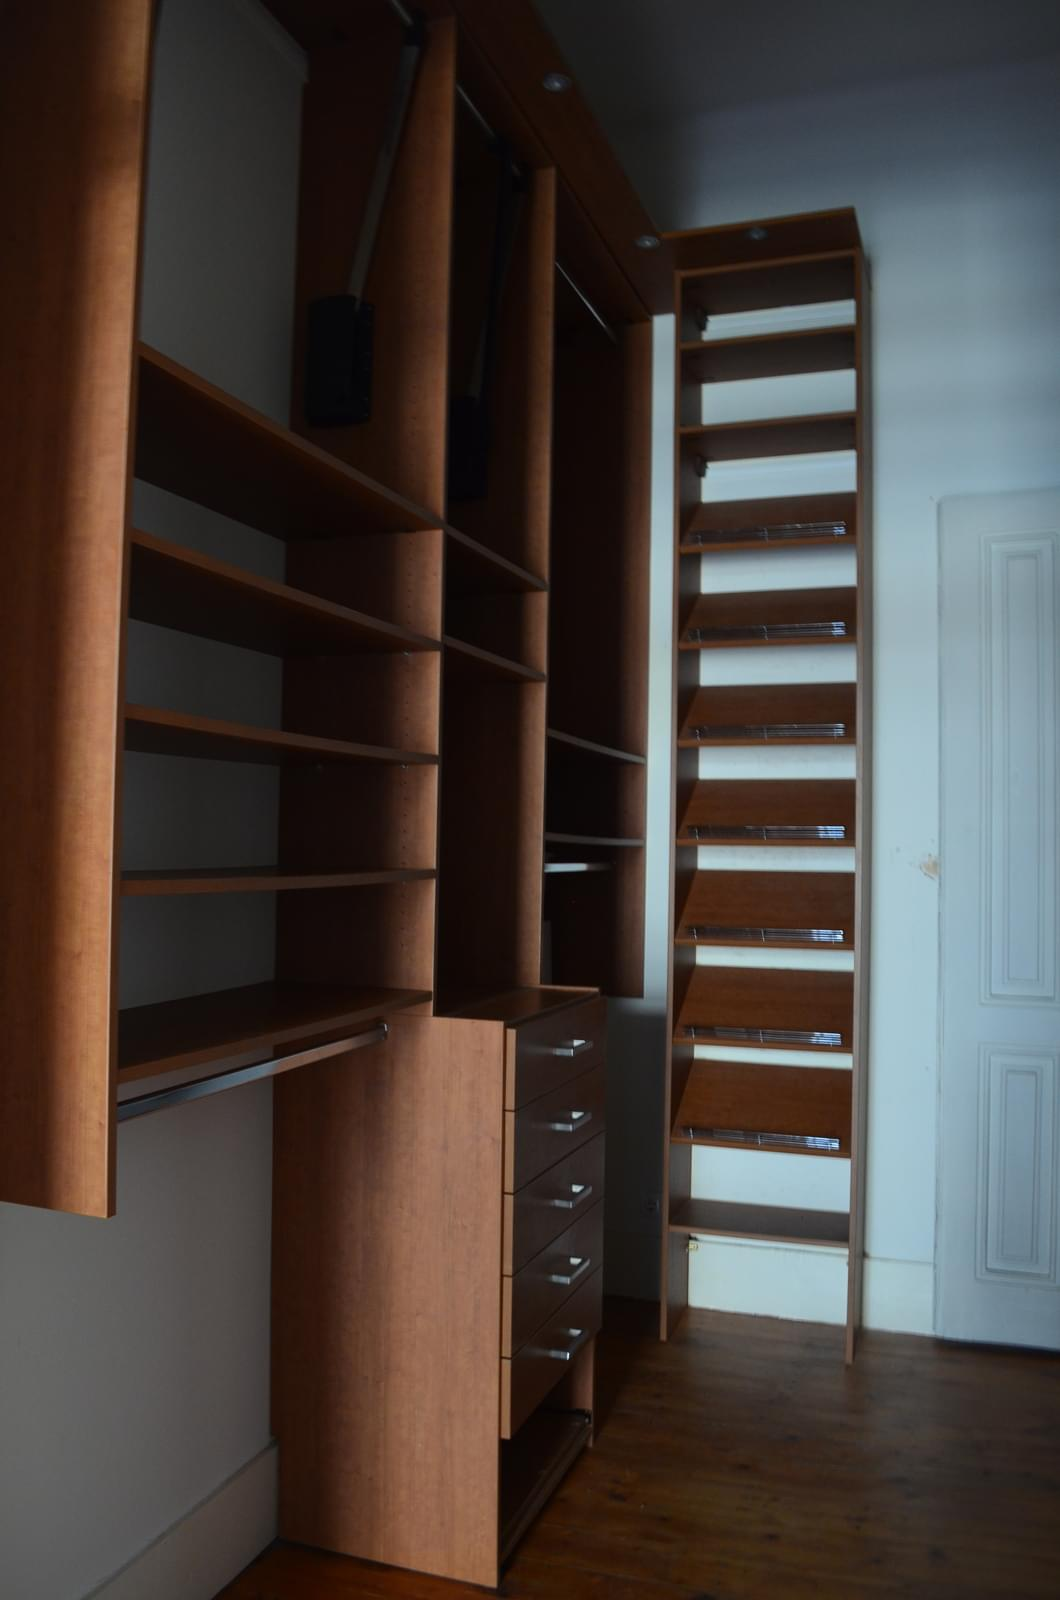 pf18621-apartamento-t4-lisboa-36d1a3e9-5717-4891-ad1a-85ac1b669ab6